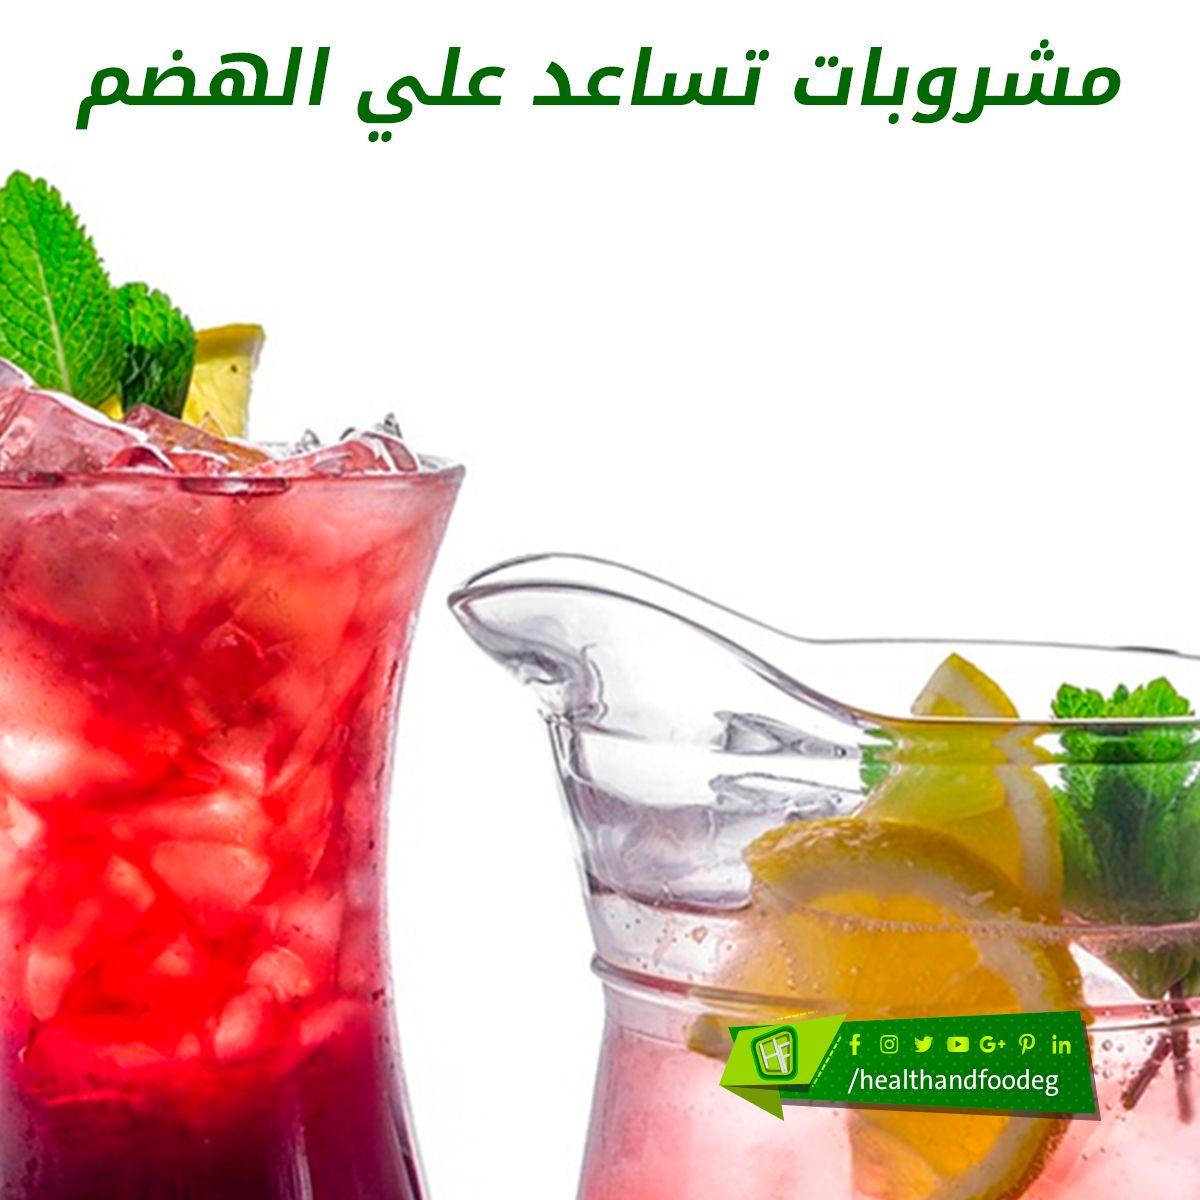 مشروبات تساعد على الهضم Juicing Recipes Juicing For Health Juice